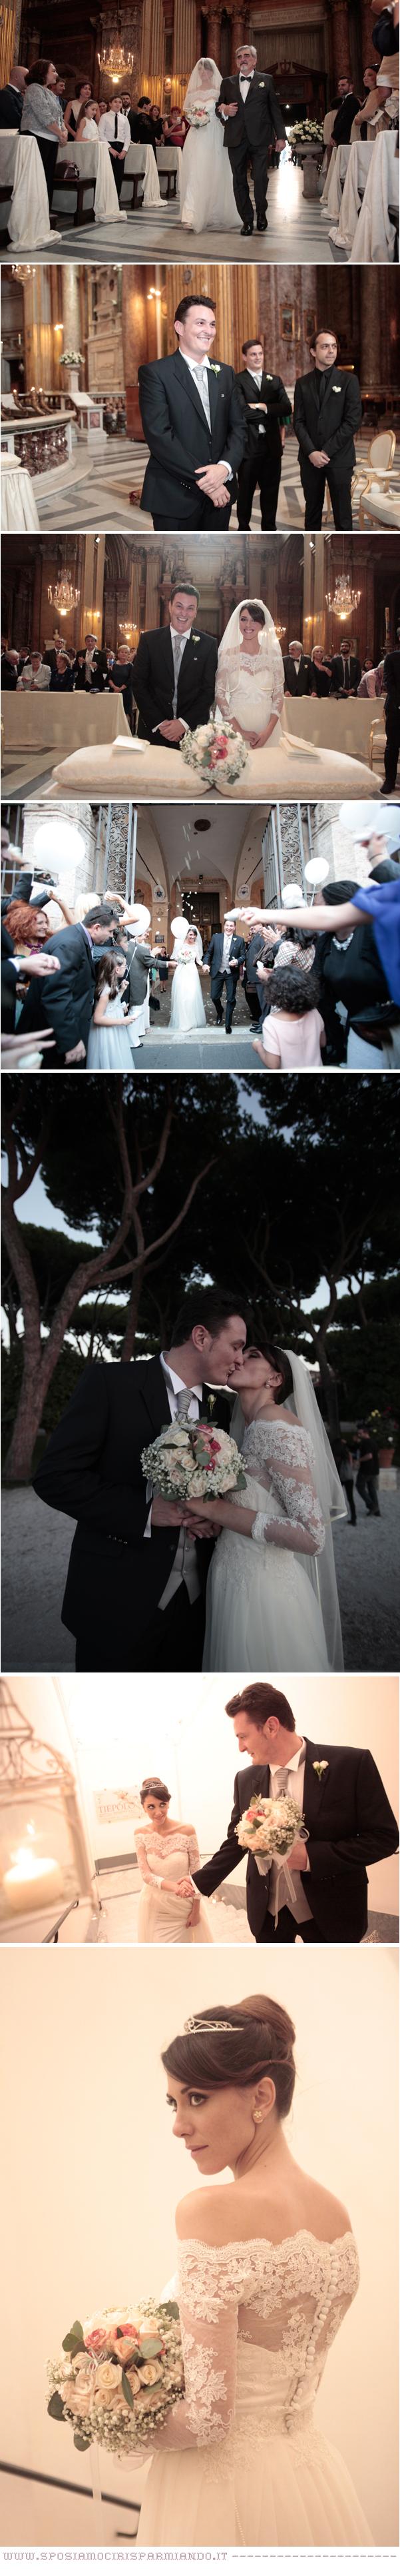 matrimonio a Roma a tema musica